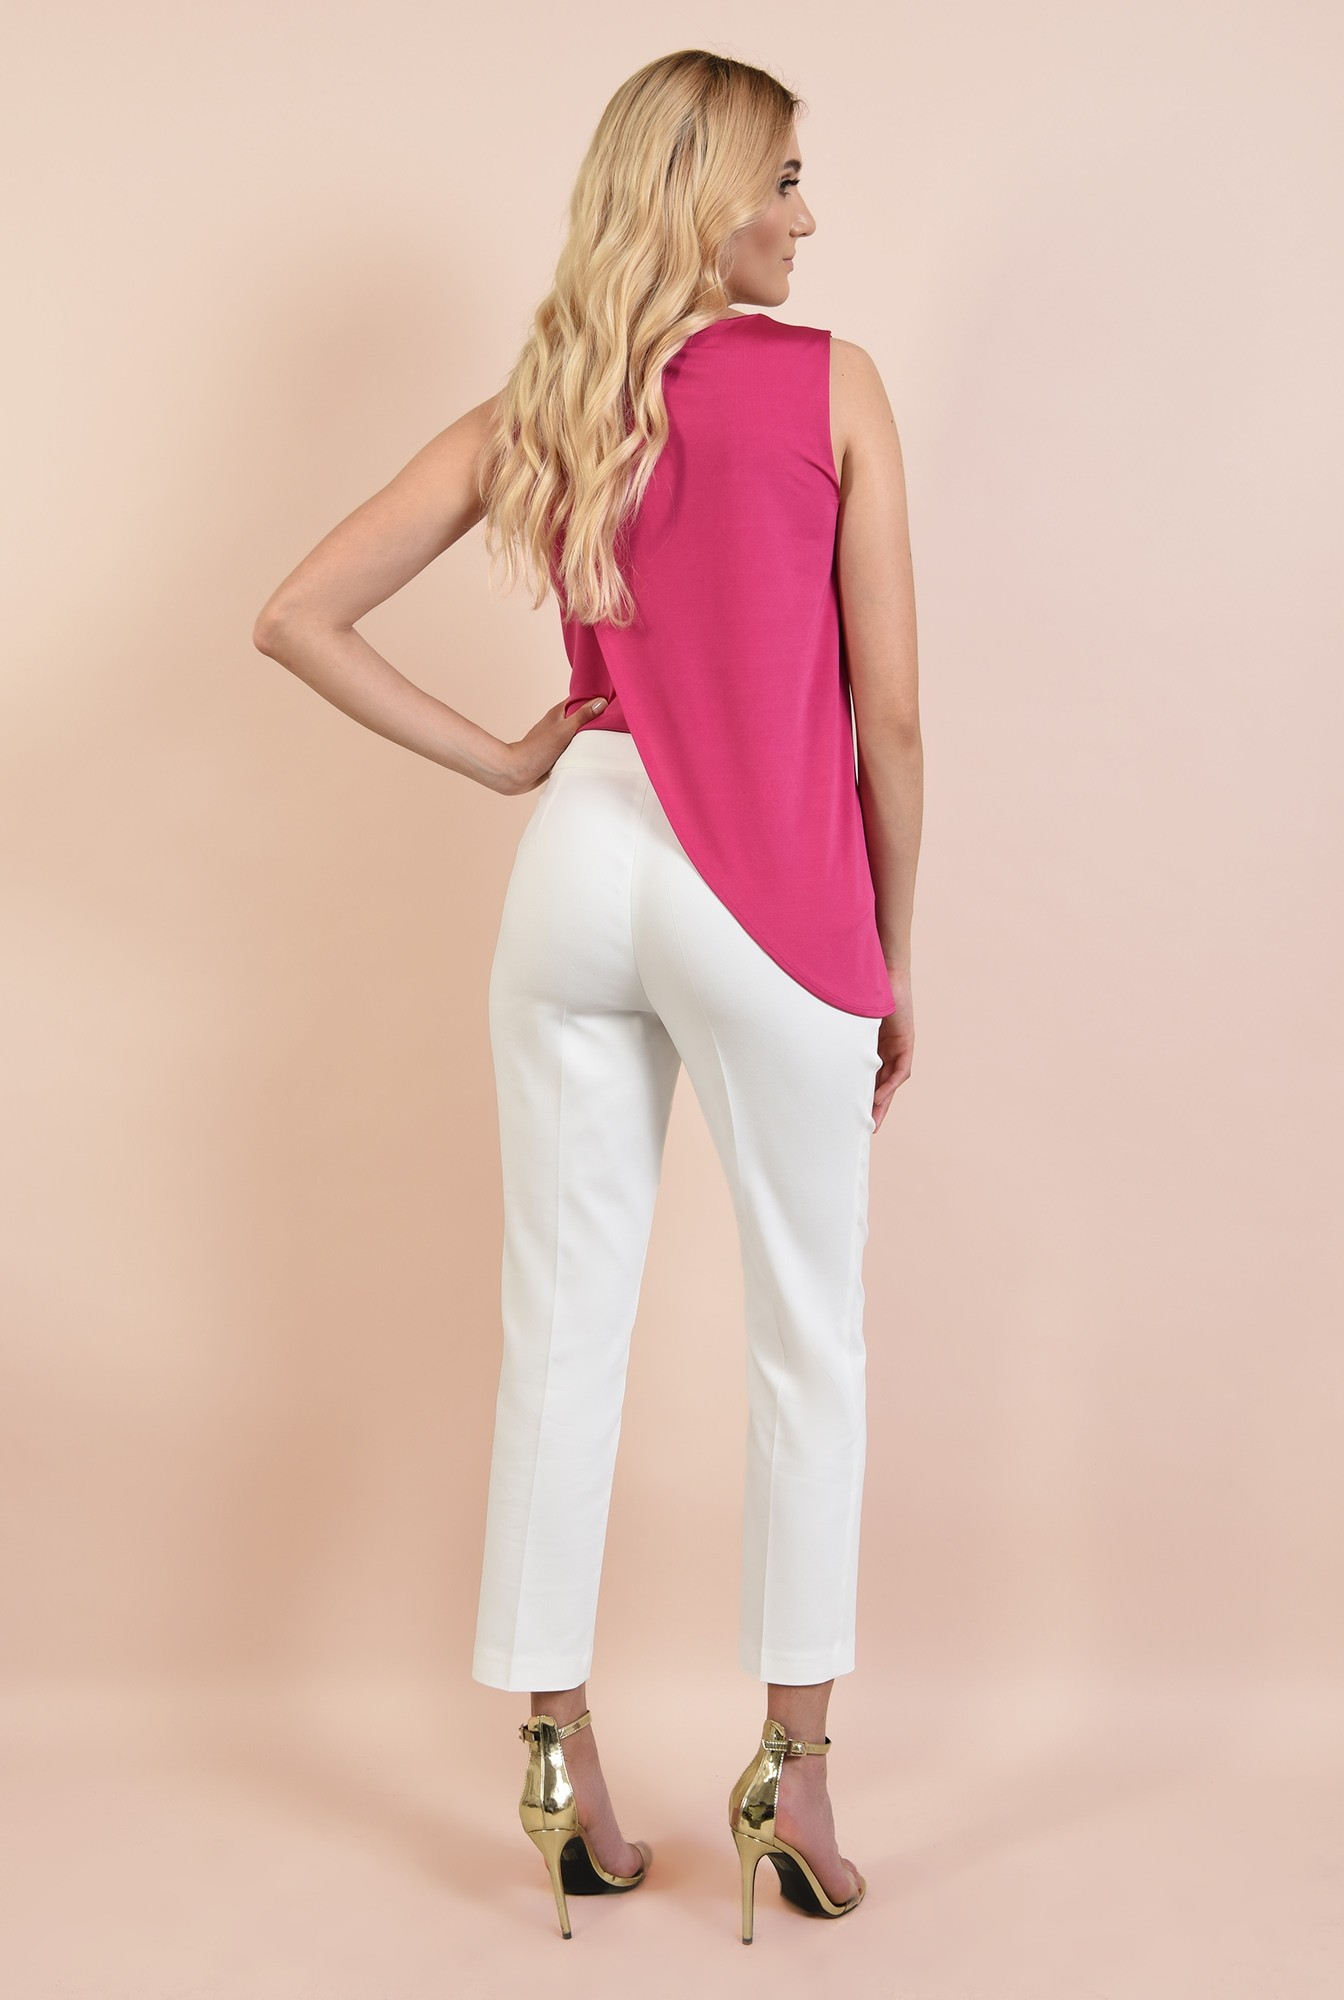 1 - bluza roz, cu fronseuri la umeri, croi parte peste parte, asimetrica